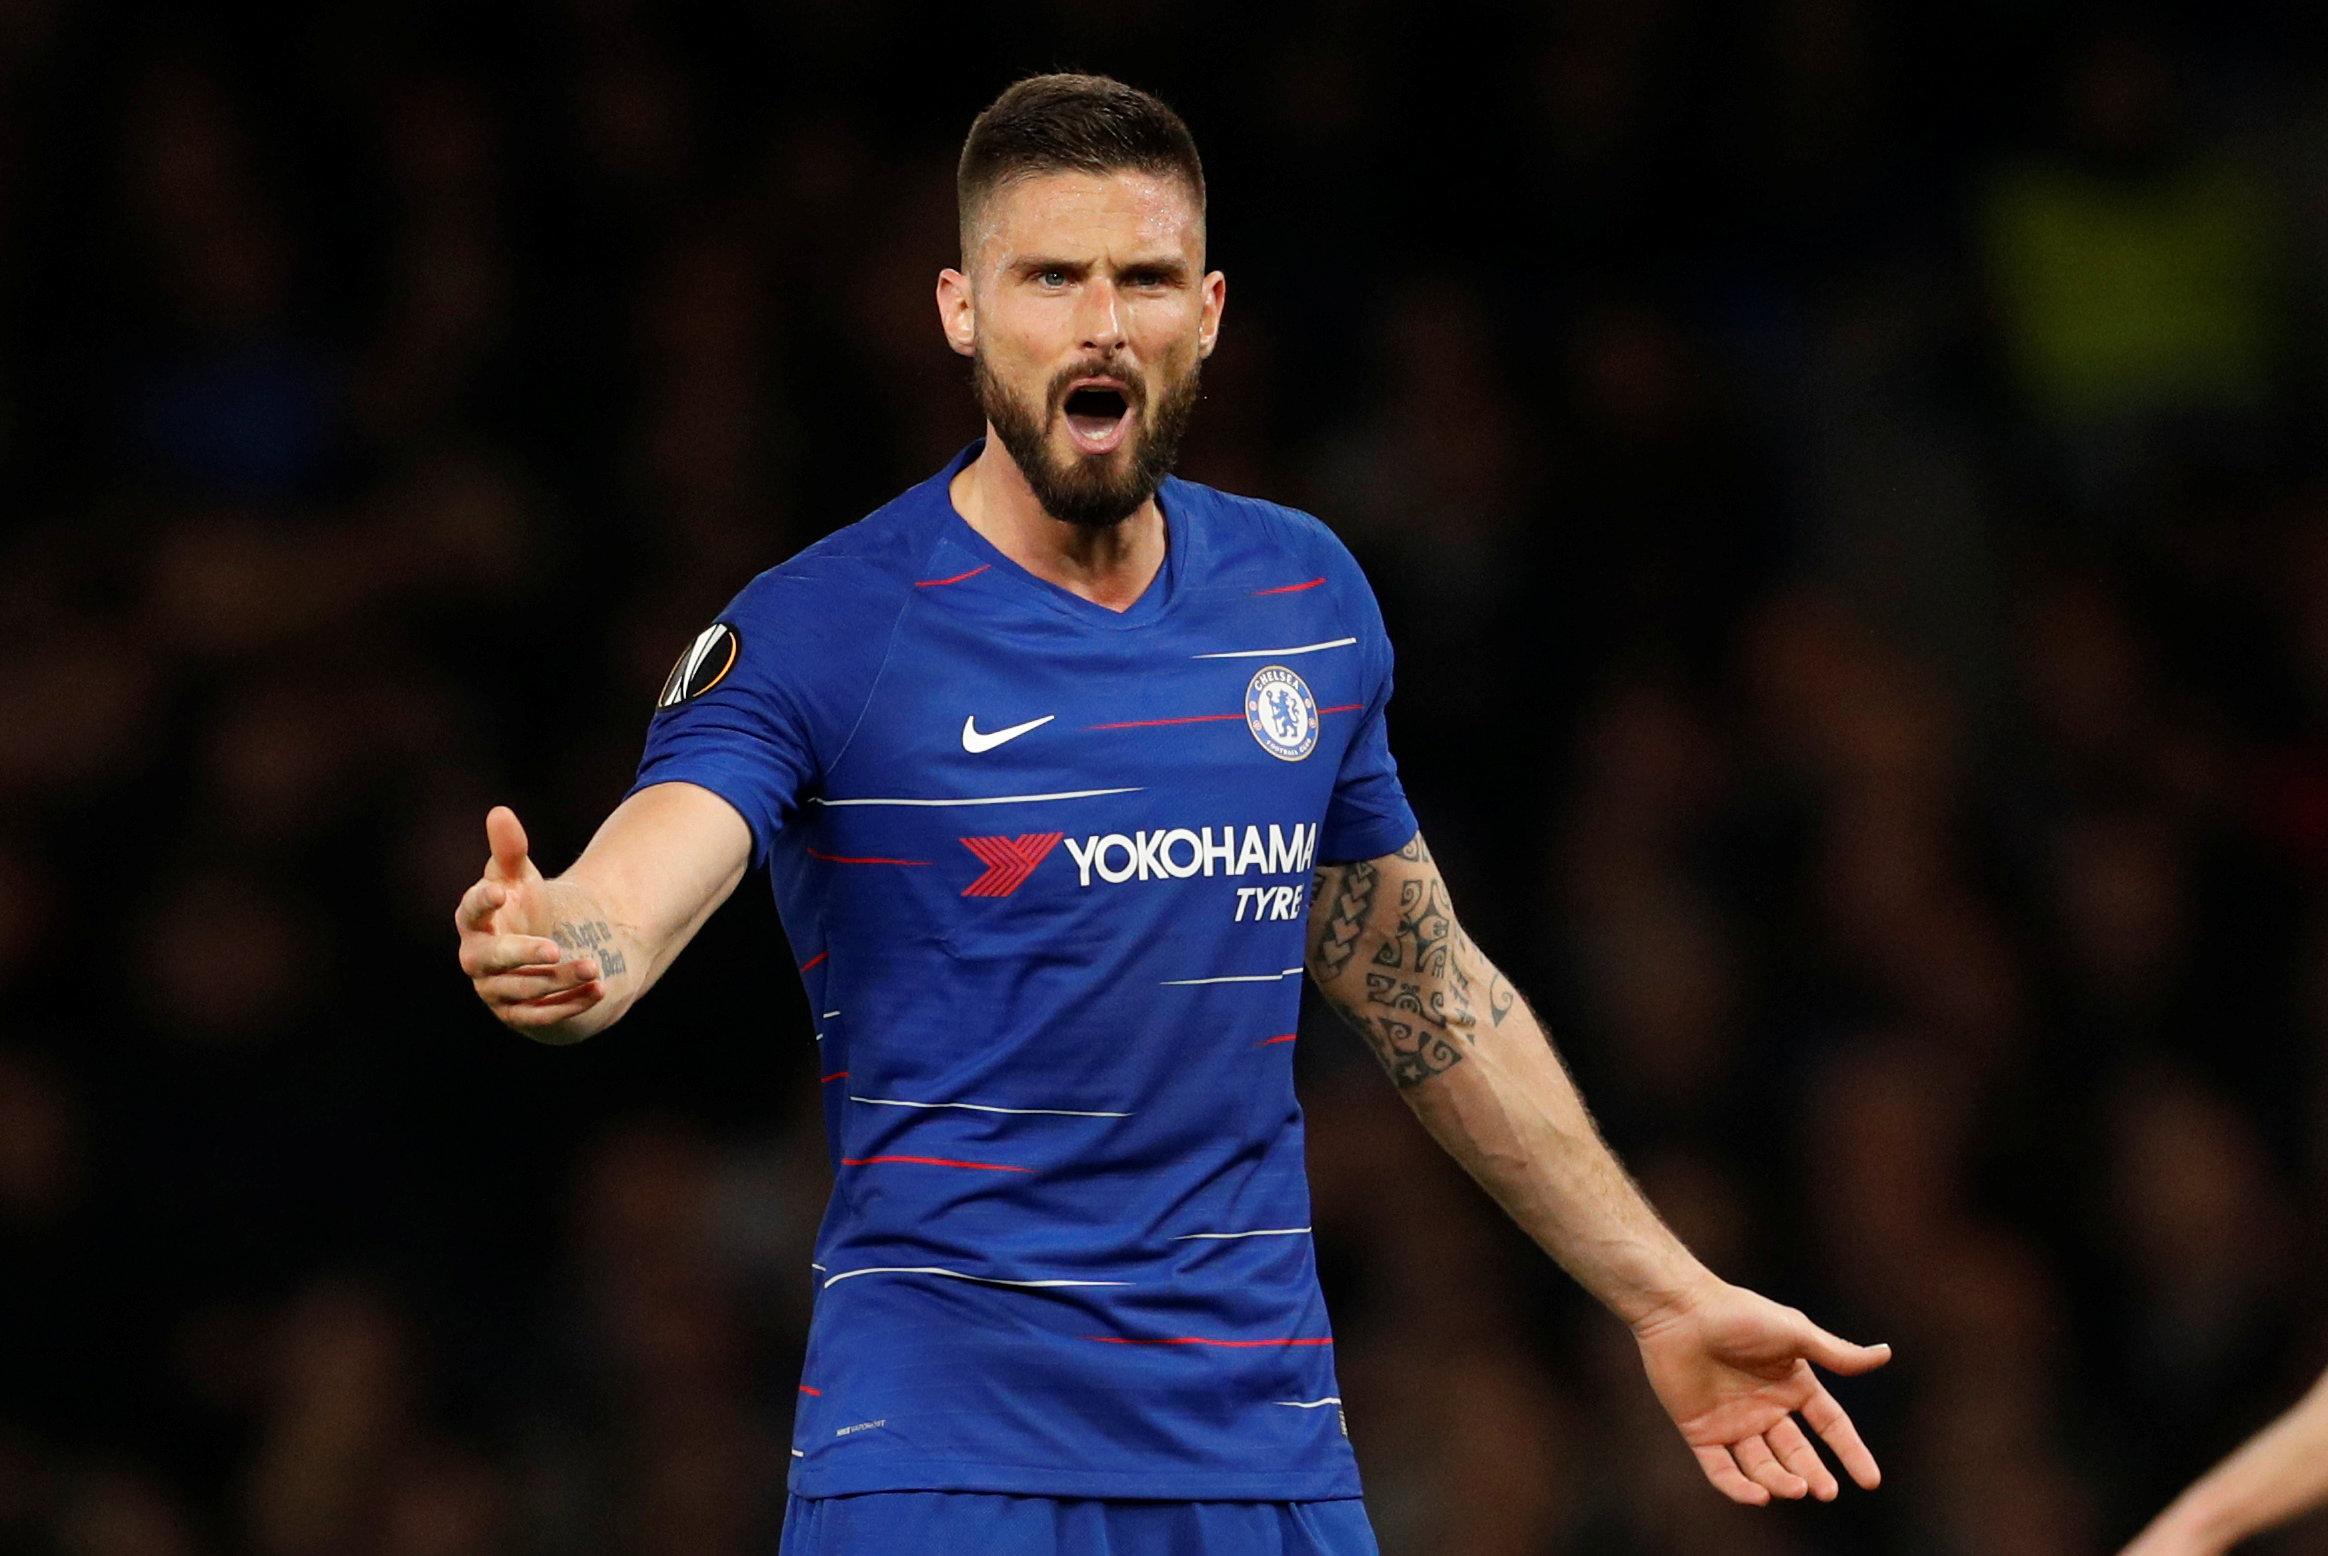 Football - Transferts - Le journal du mercato : Giroud attire l'attention de Nice